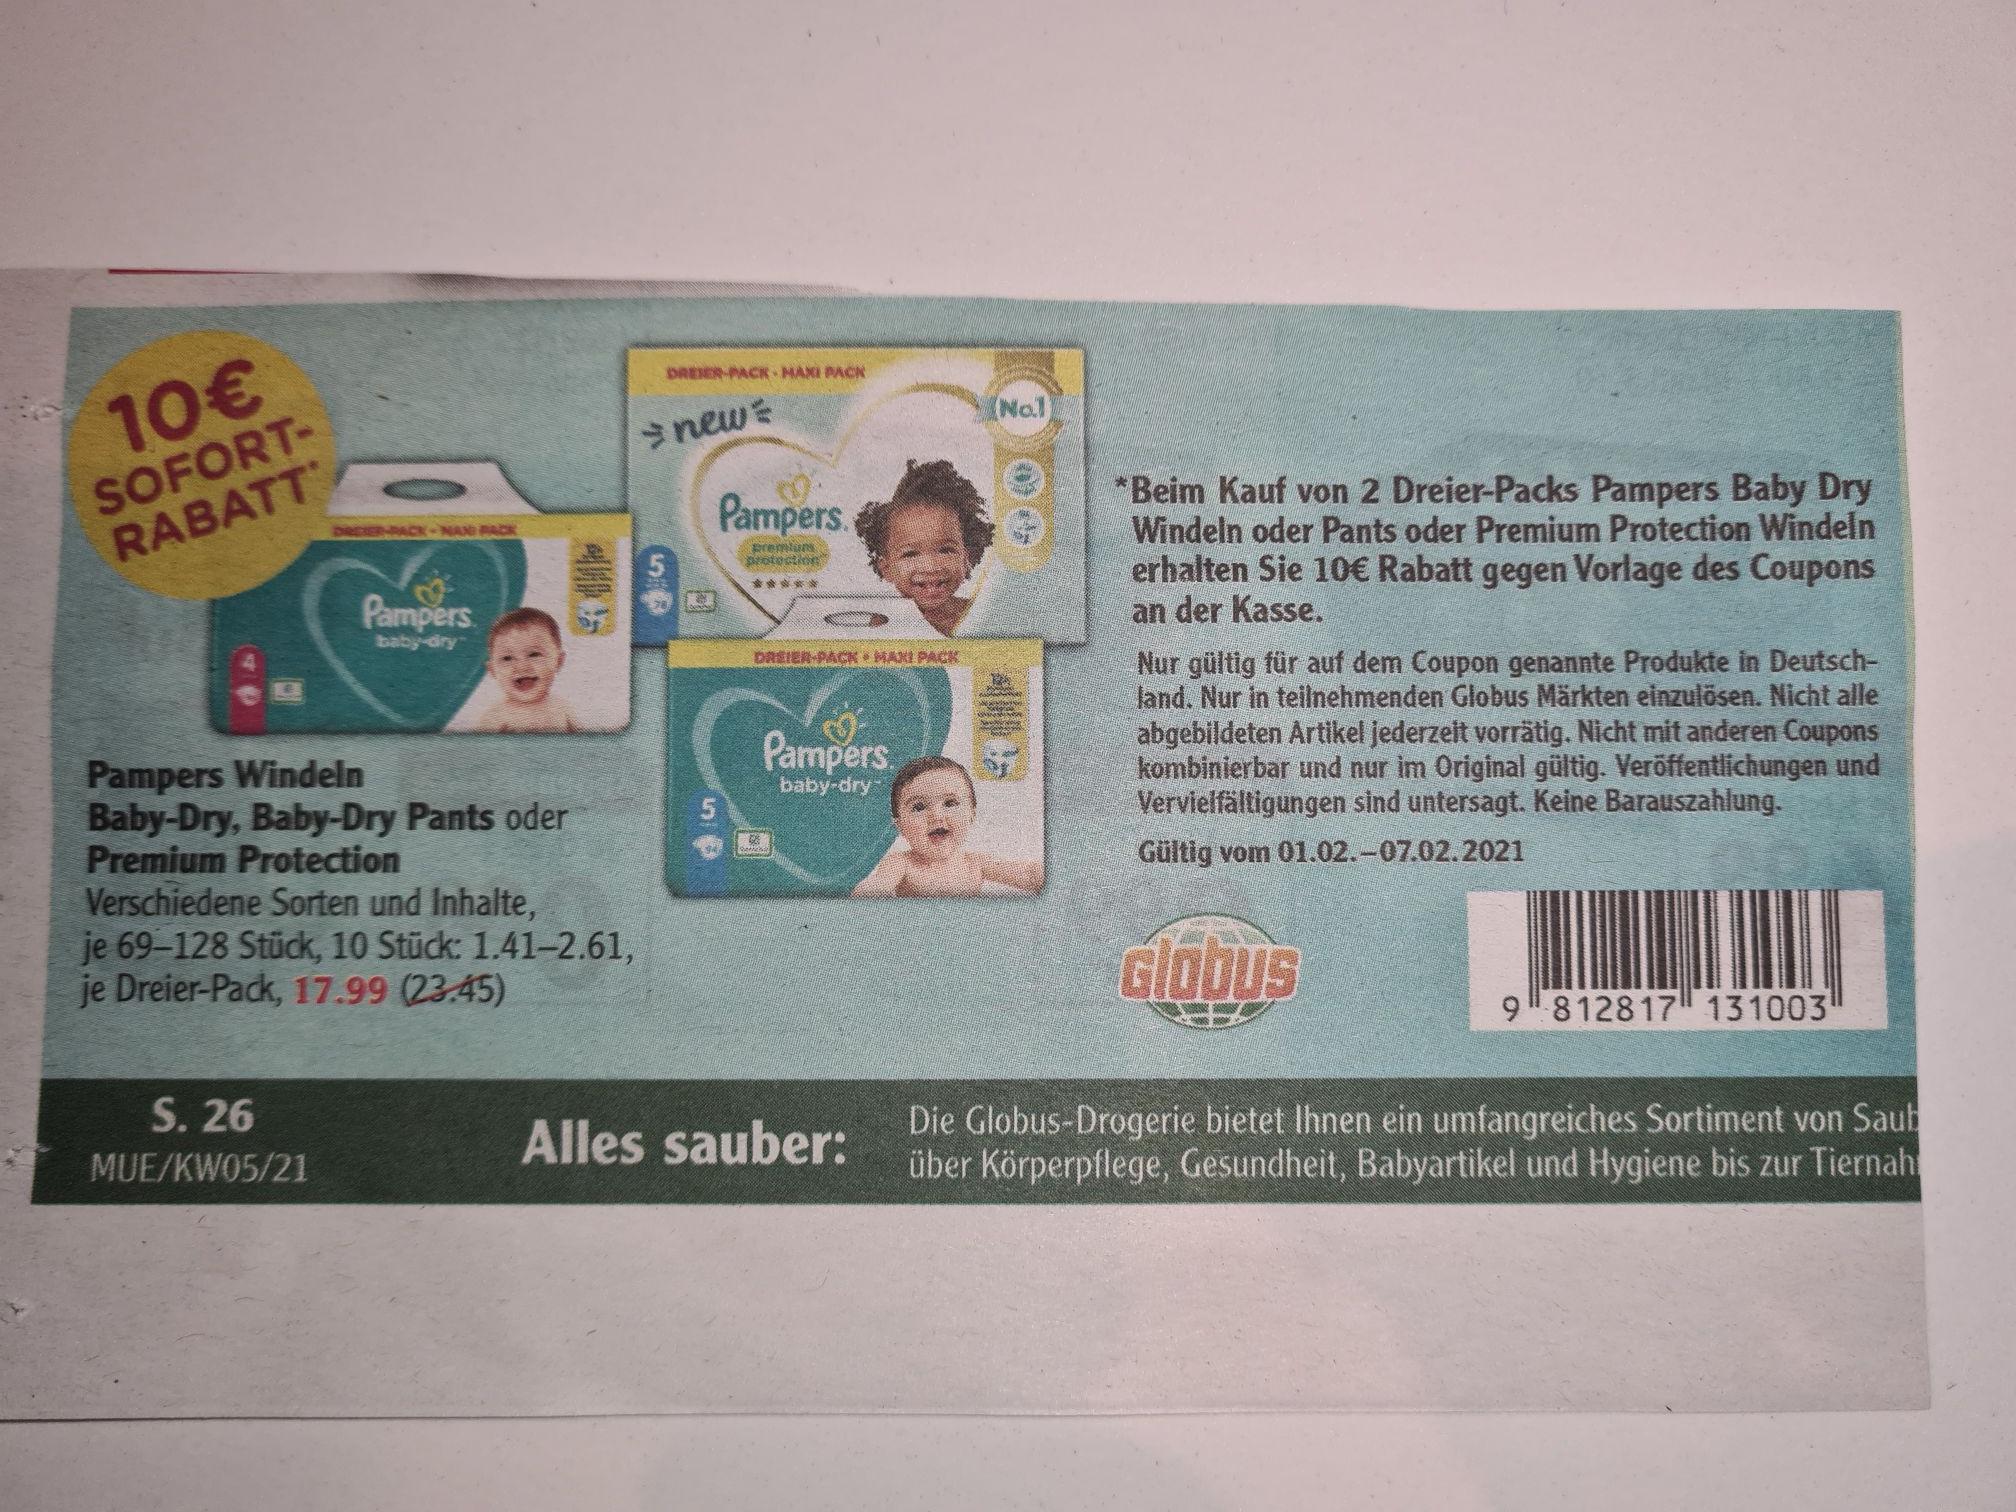 Pampers 2x Dreier-Pack Baby-Dry, Baby-Dry Pants, Premium Protection Angebot + 10€ Rabatt bei Globus (1.-6.2)